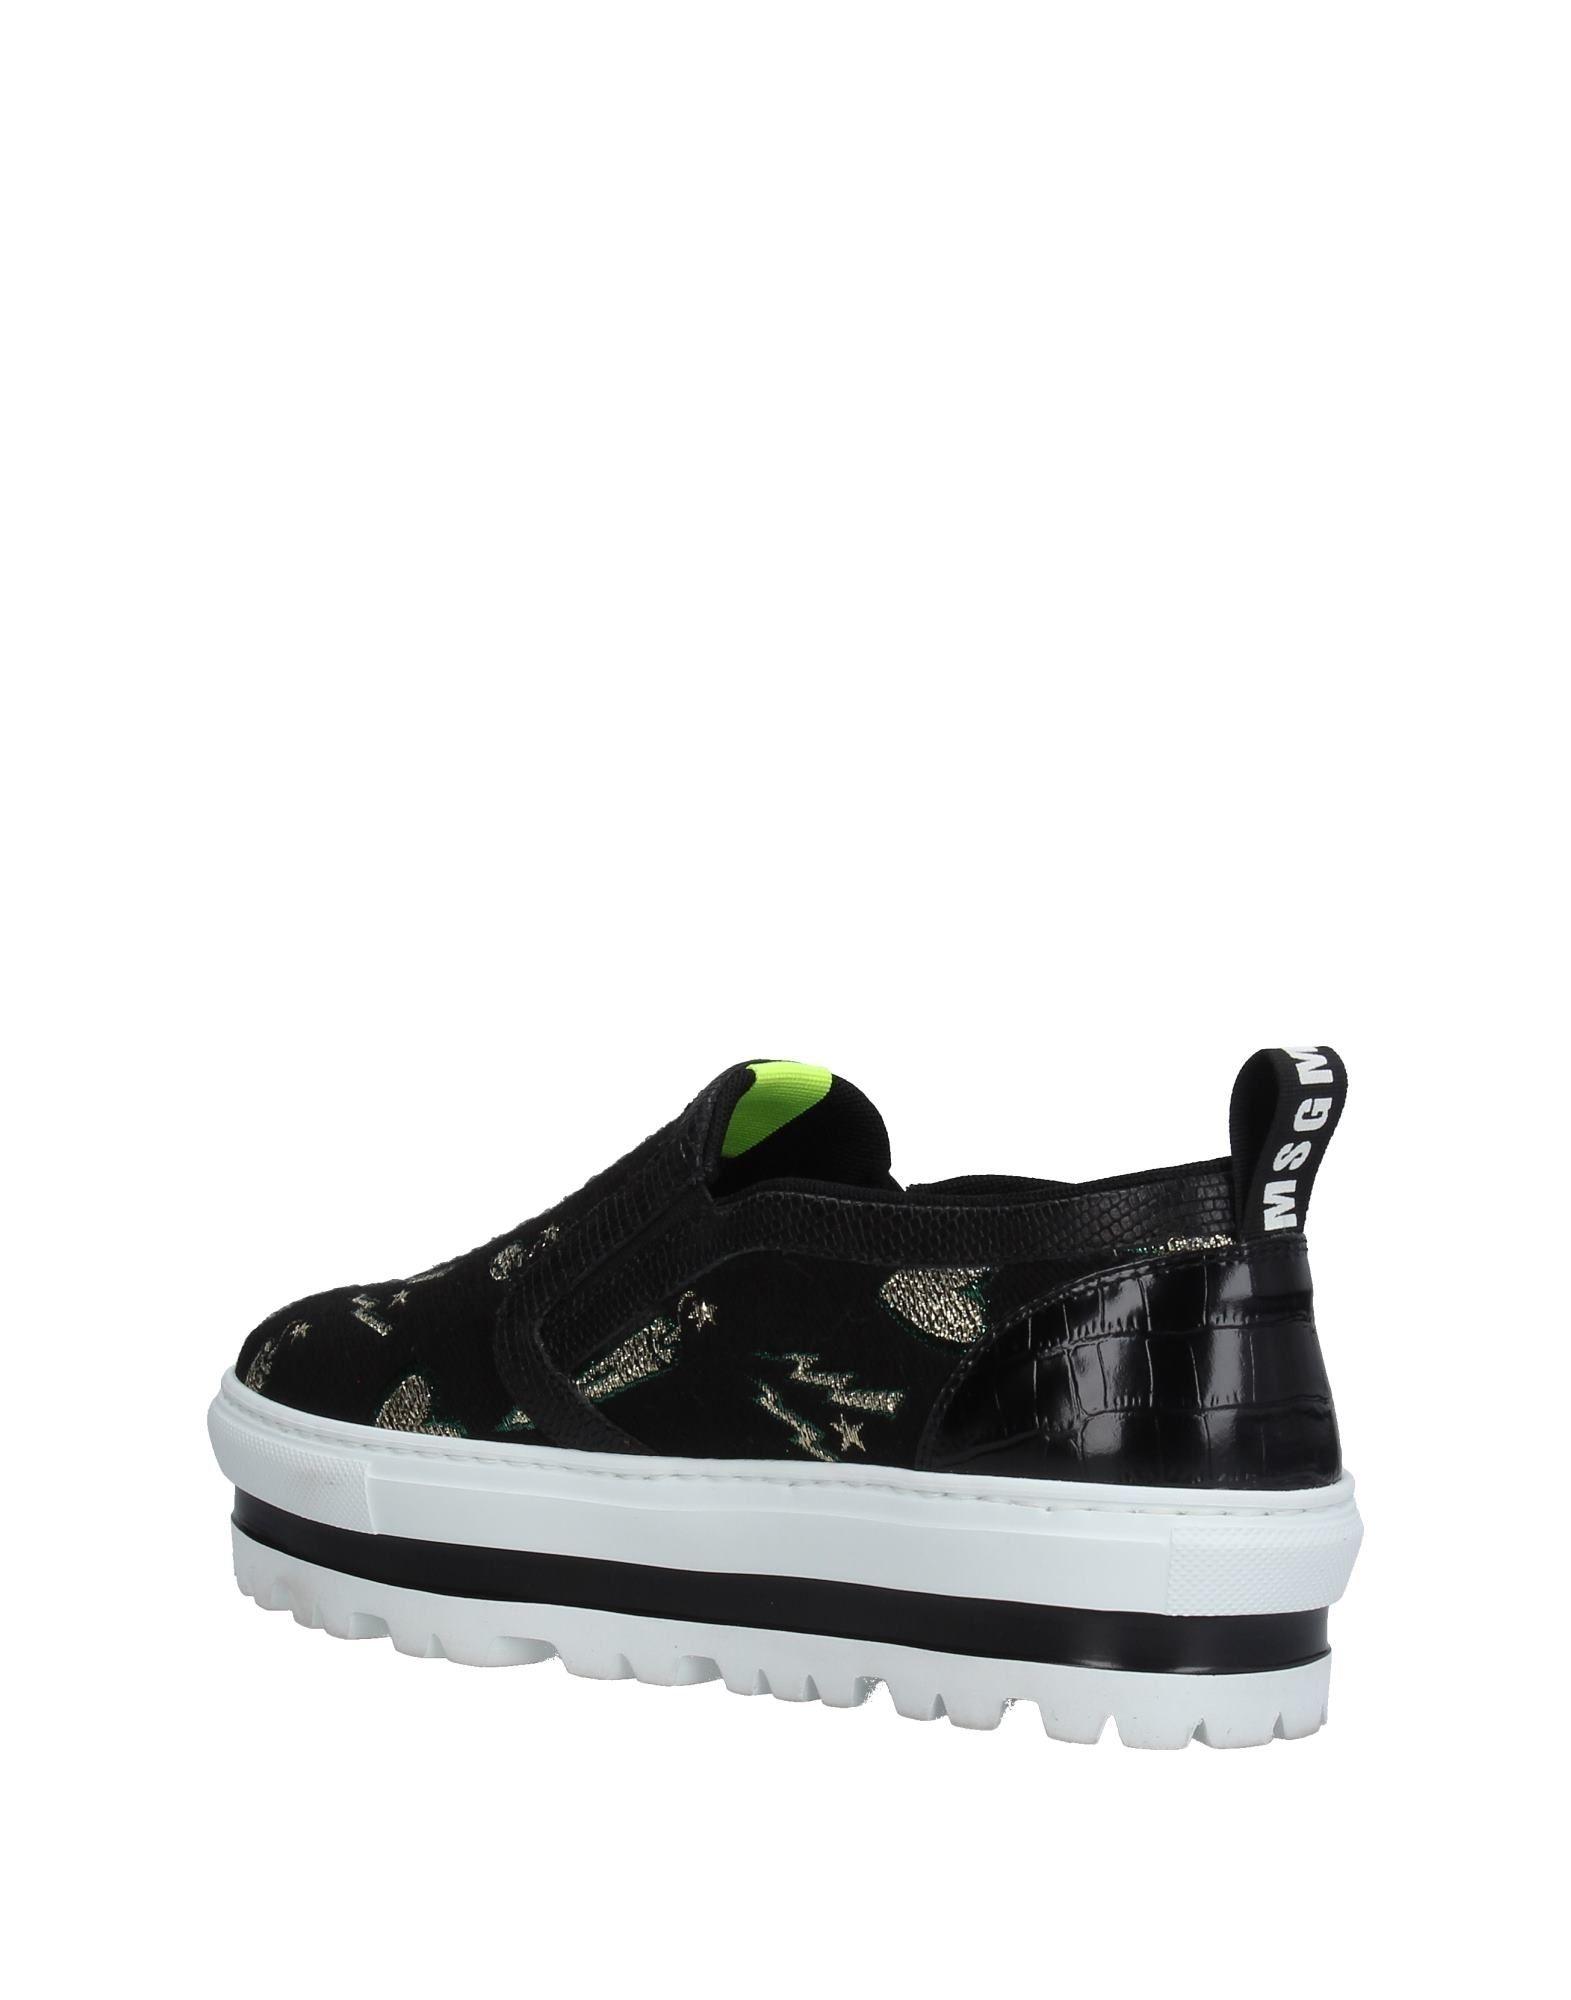 Msgm  Sneakers Damen  Msgm 11236239UP Heiße Schuhe 5d3022